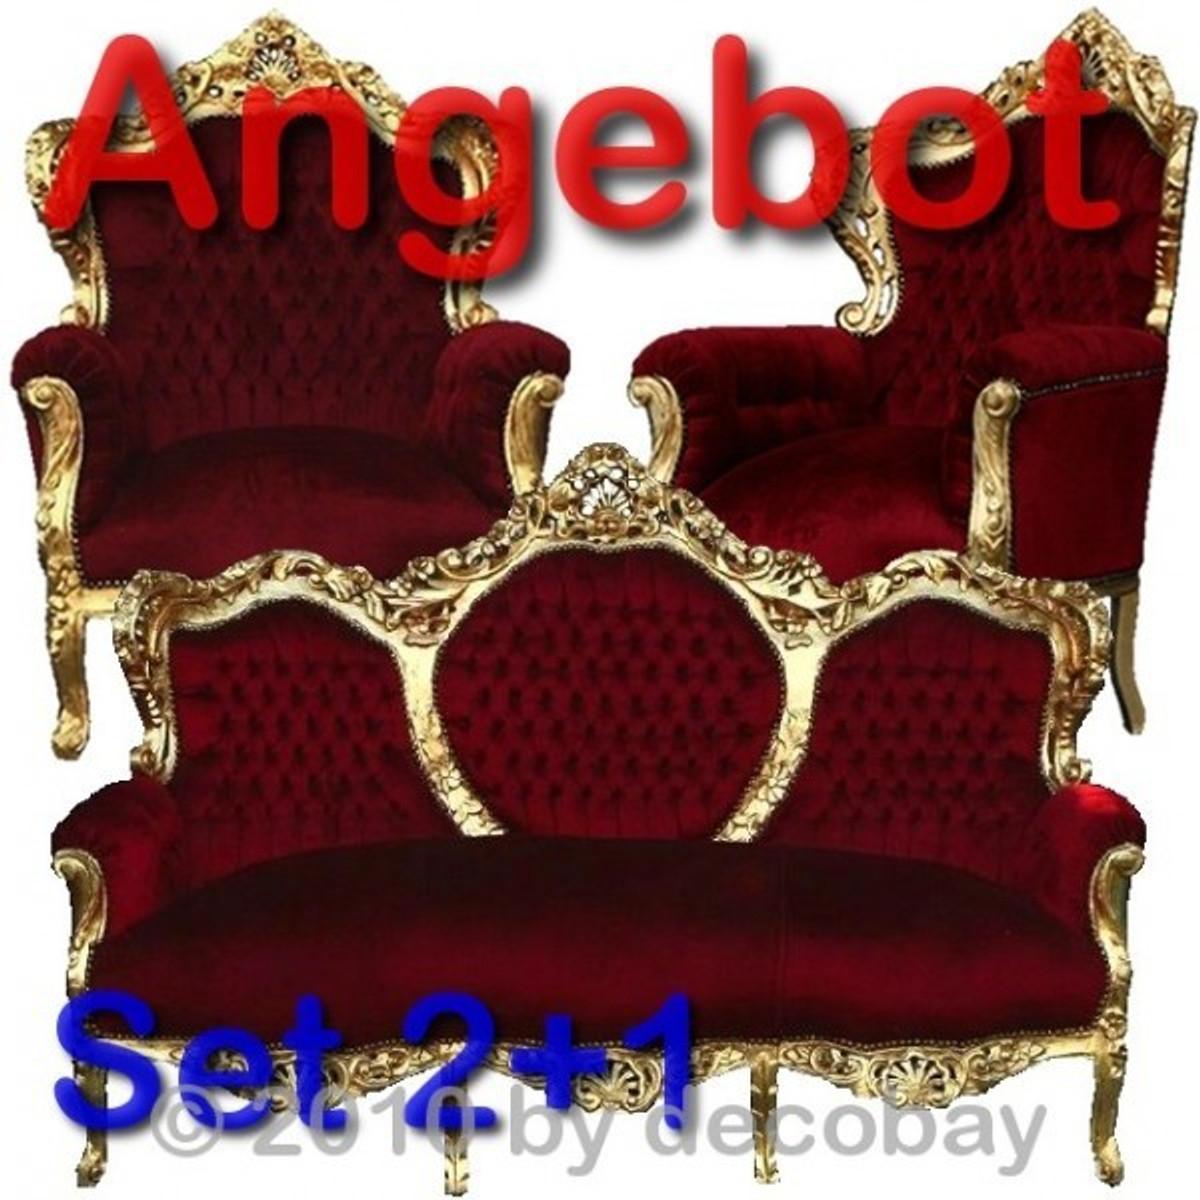 Wohnzimmermöbel Aus Holz Barock Sessel Sofa Antik SPARSET Rot Gold ANGEBOT